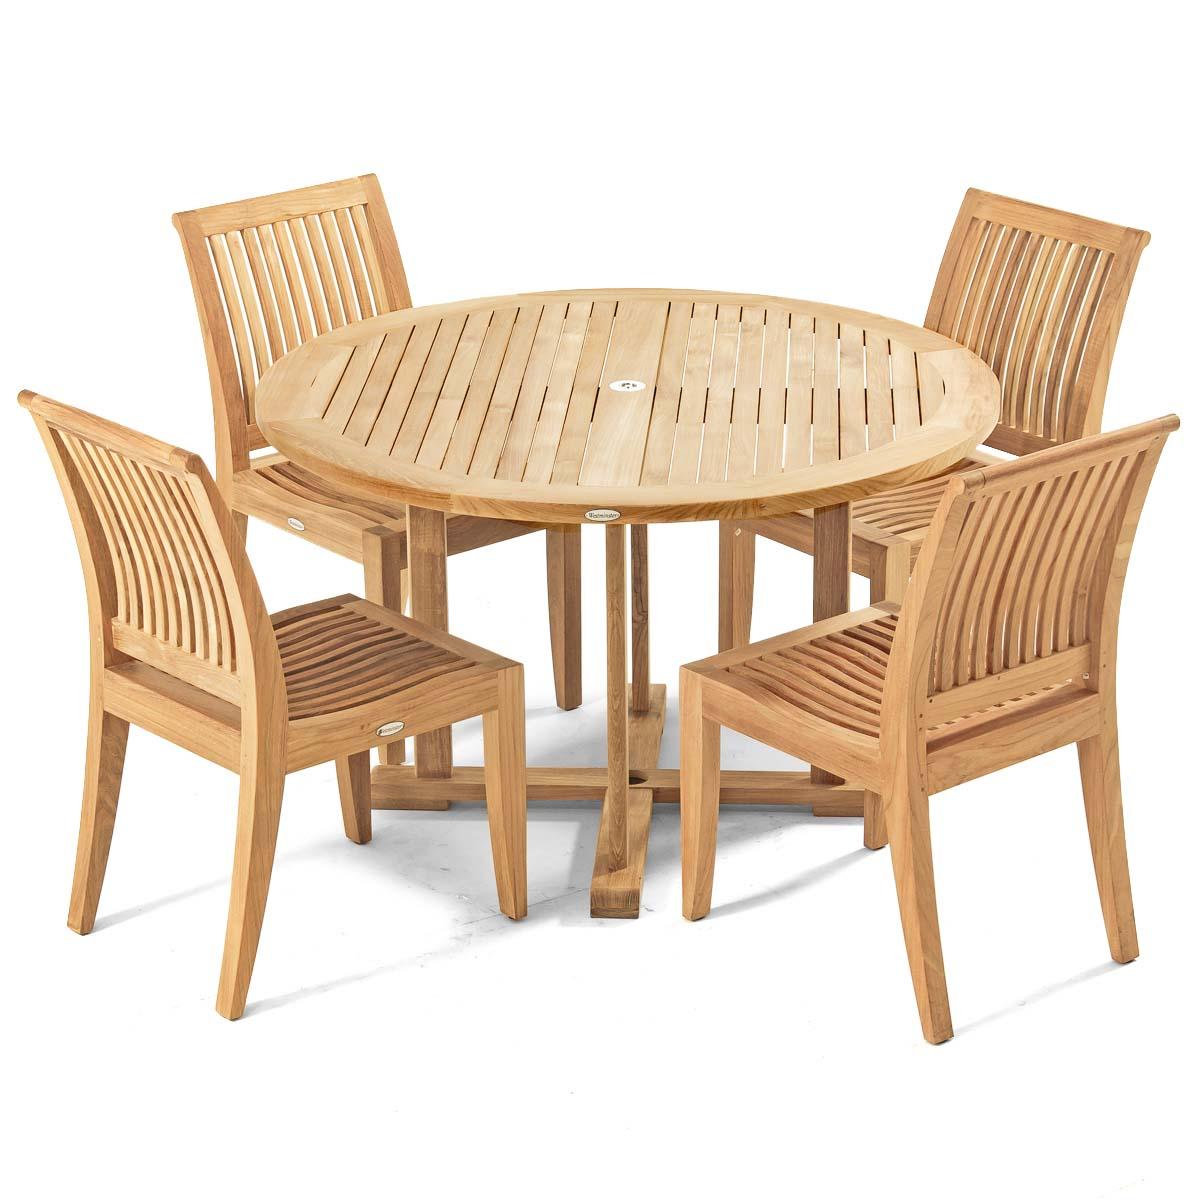 Laguna 4ft round teak sidechair set westminster teak outdoor furniture - Round teak table and chairs ...